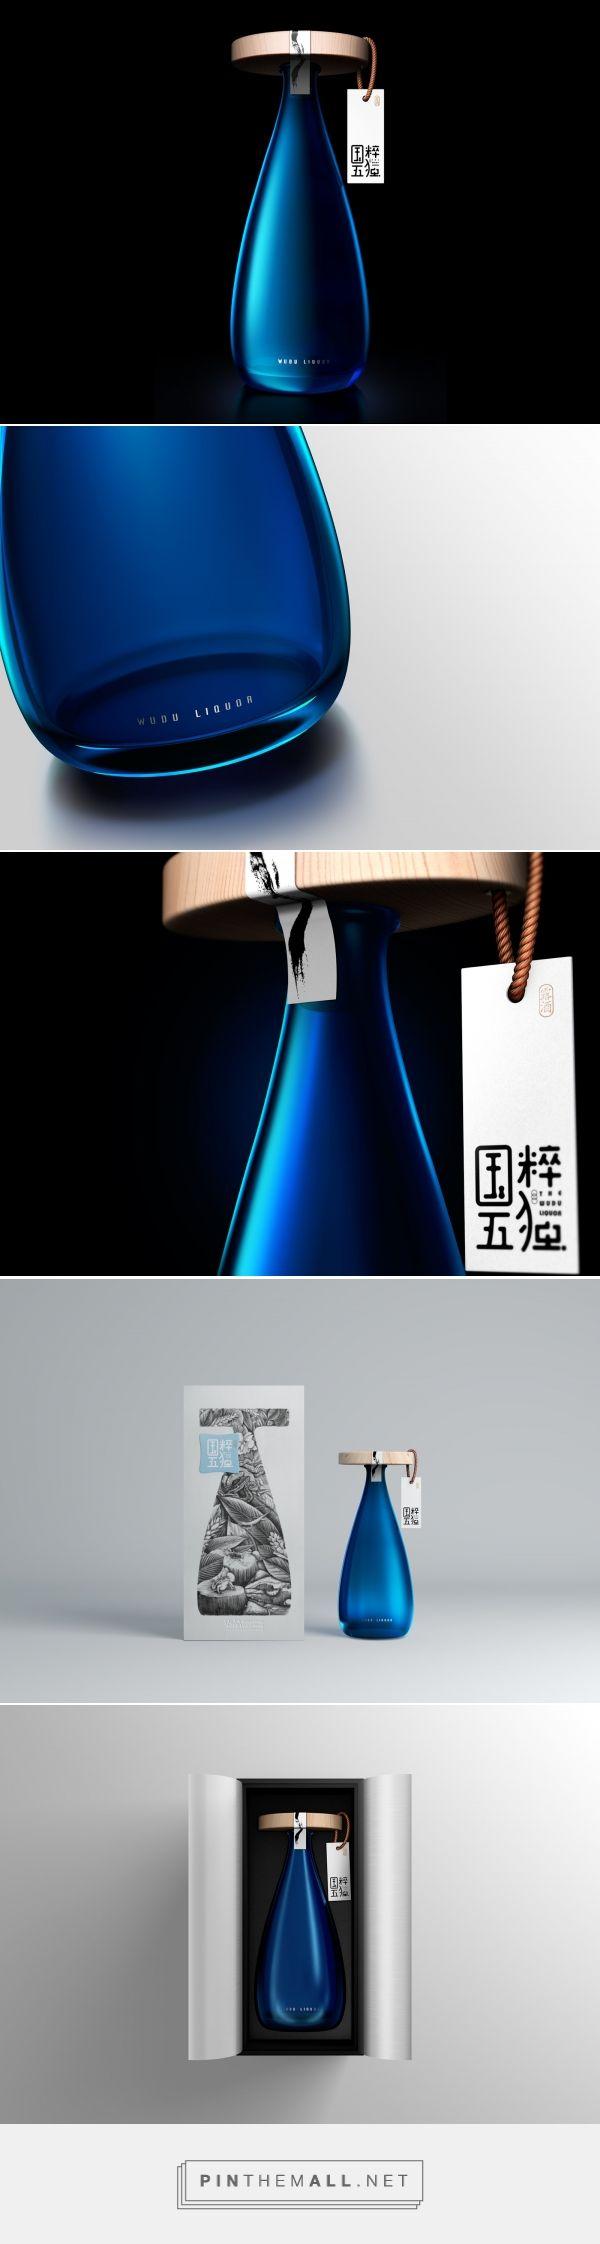 GU OC UI W UD u liquor packaging design by Lin耕耘creative - HTTP://呜呜呜.packaging of T和world.com/2017/03/过-催-无-度-liquor.HTML